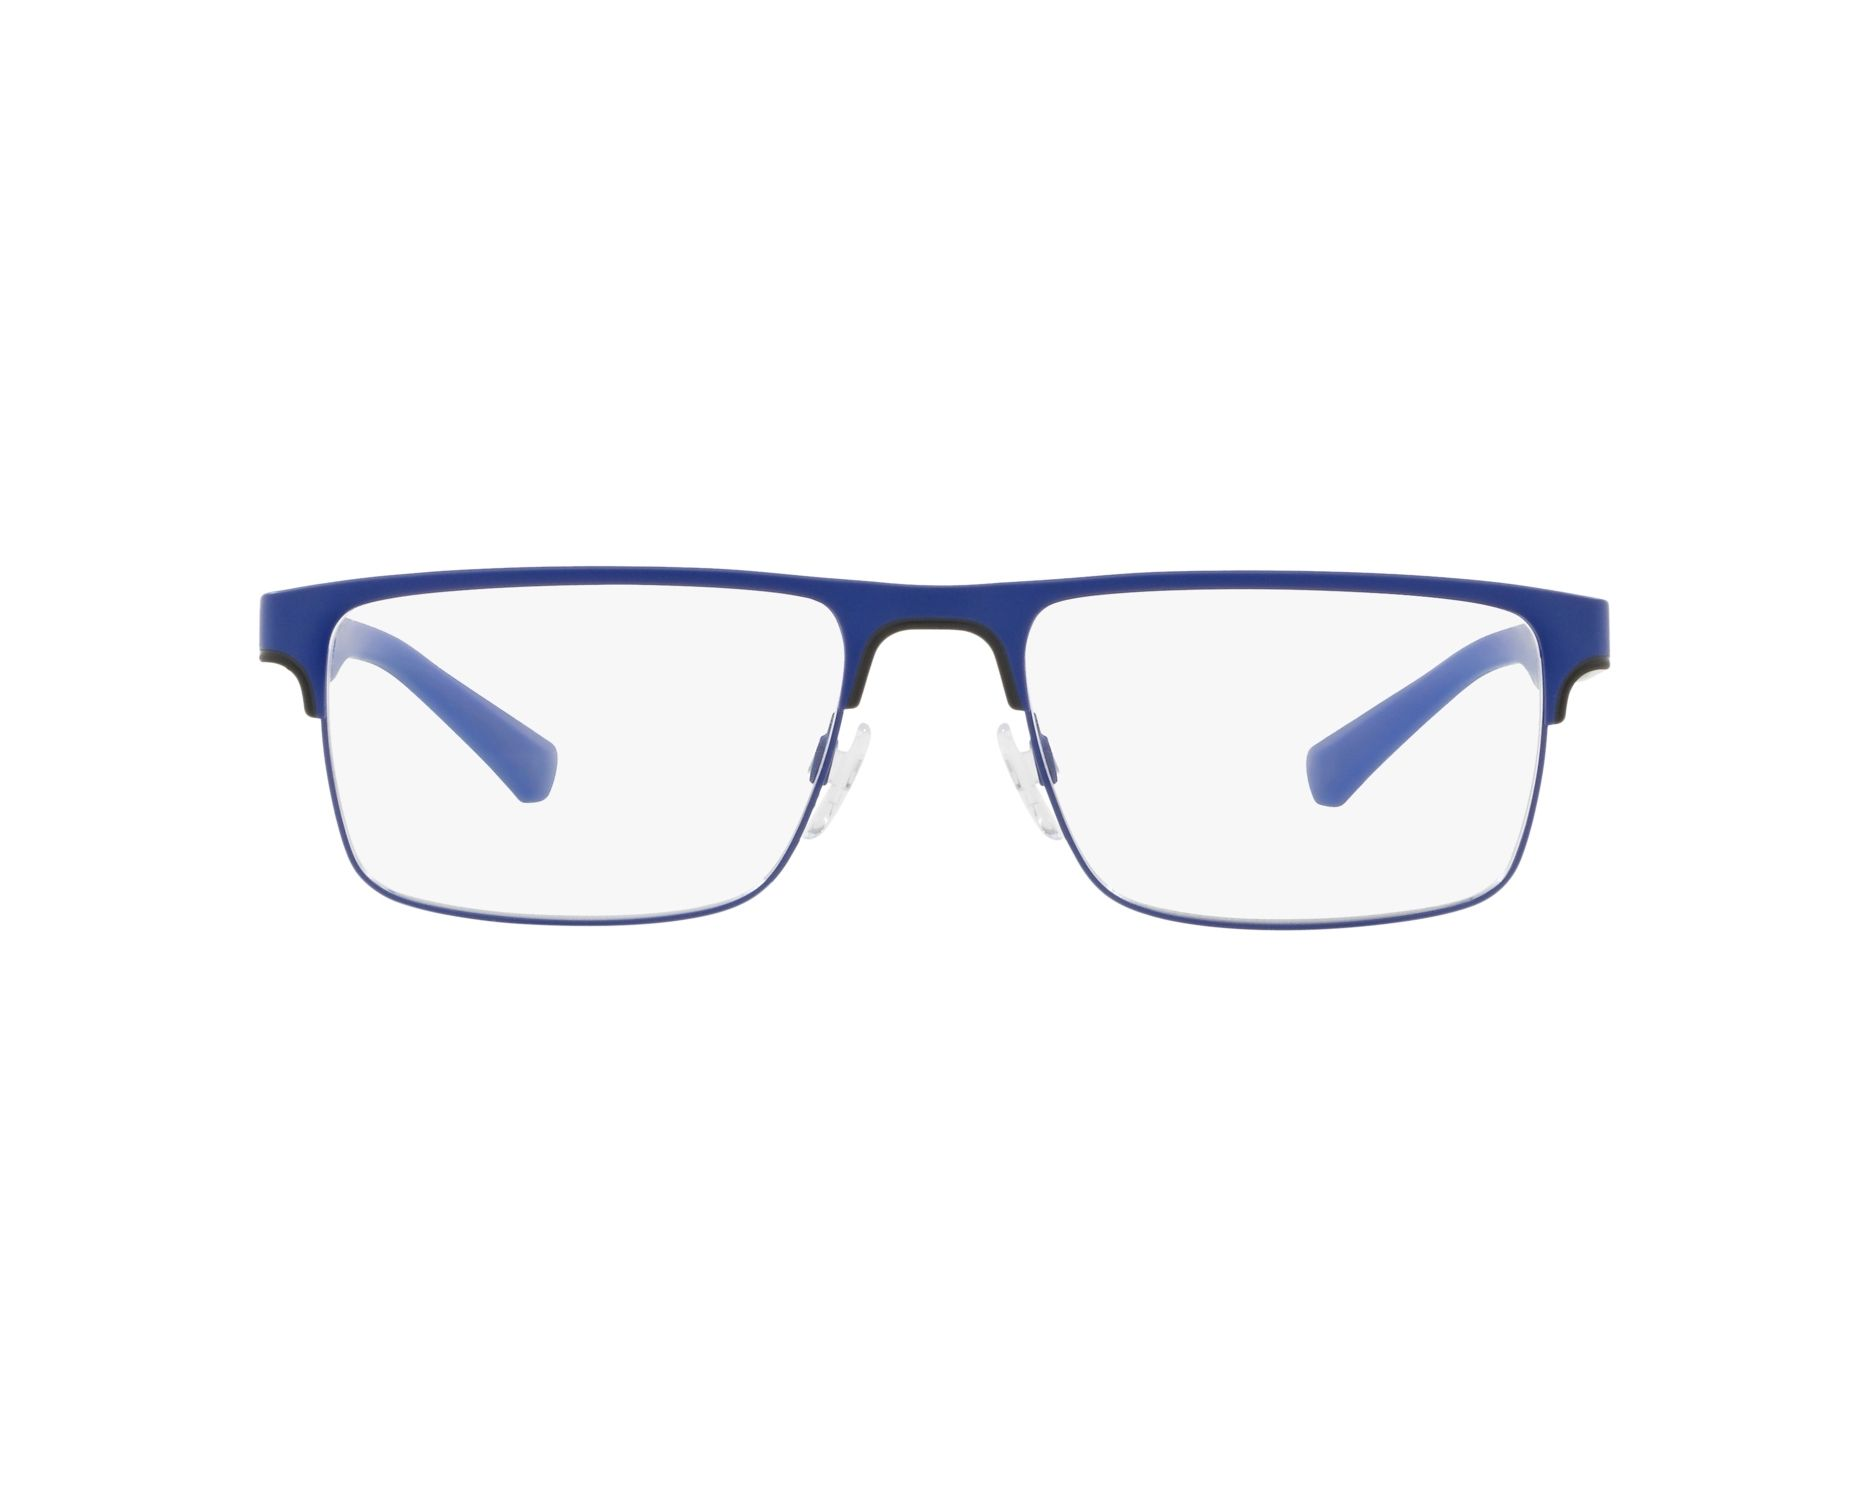 Emporio Armani Herren Brille » EA1075«, blau, 3229 - blau